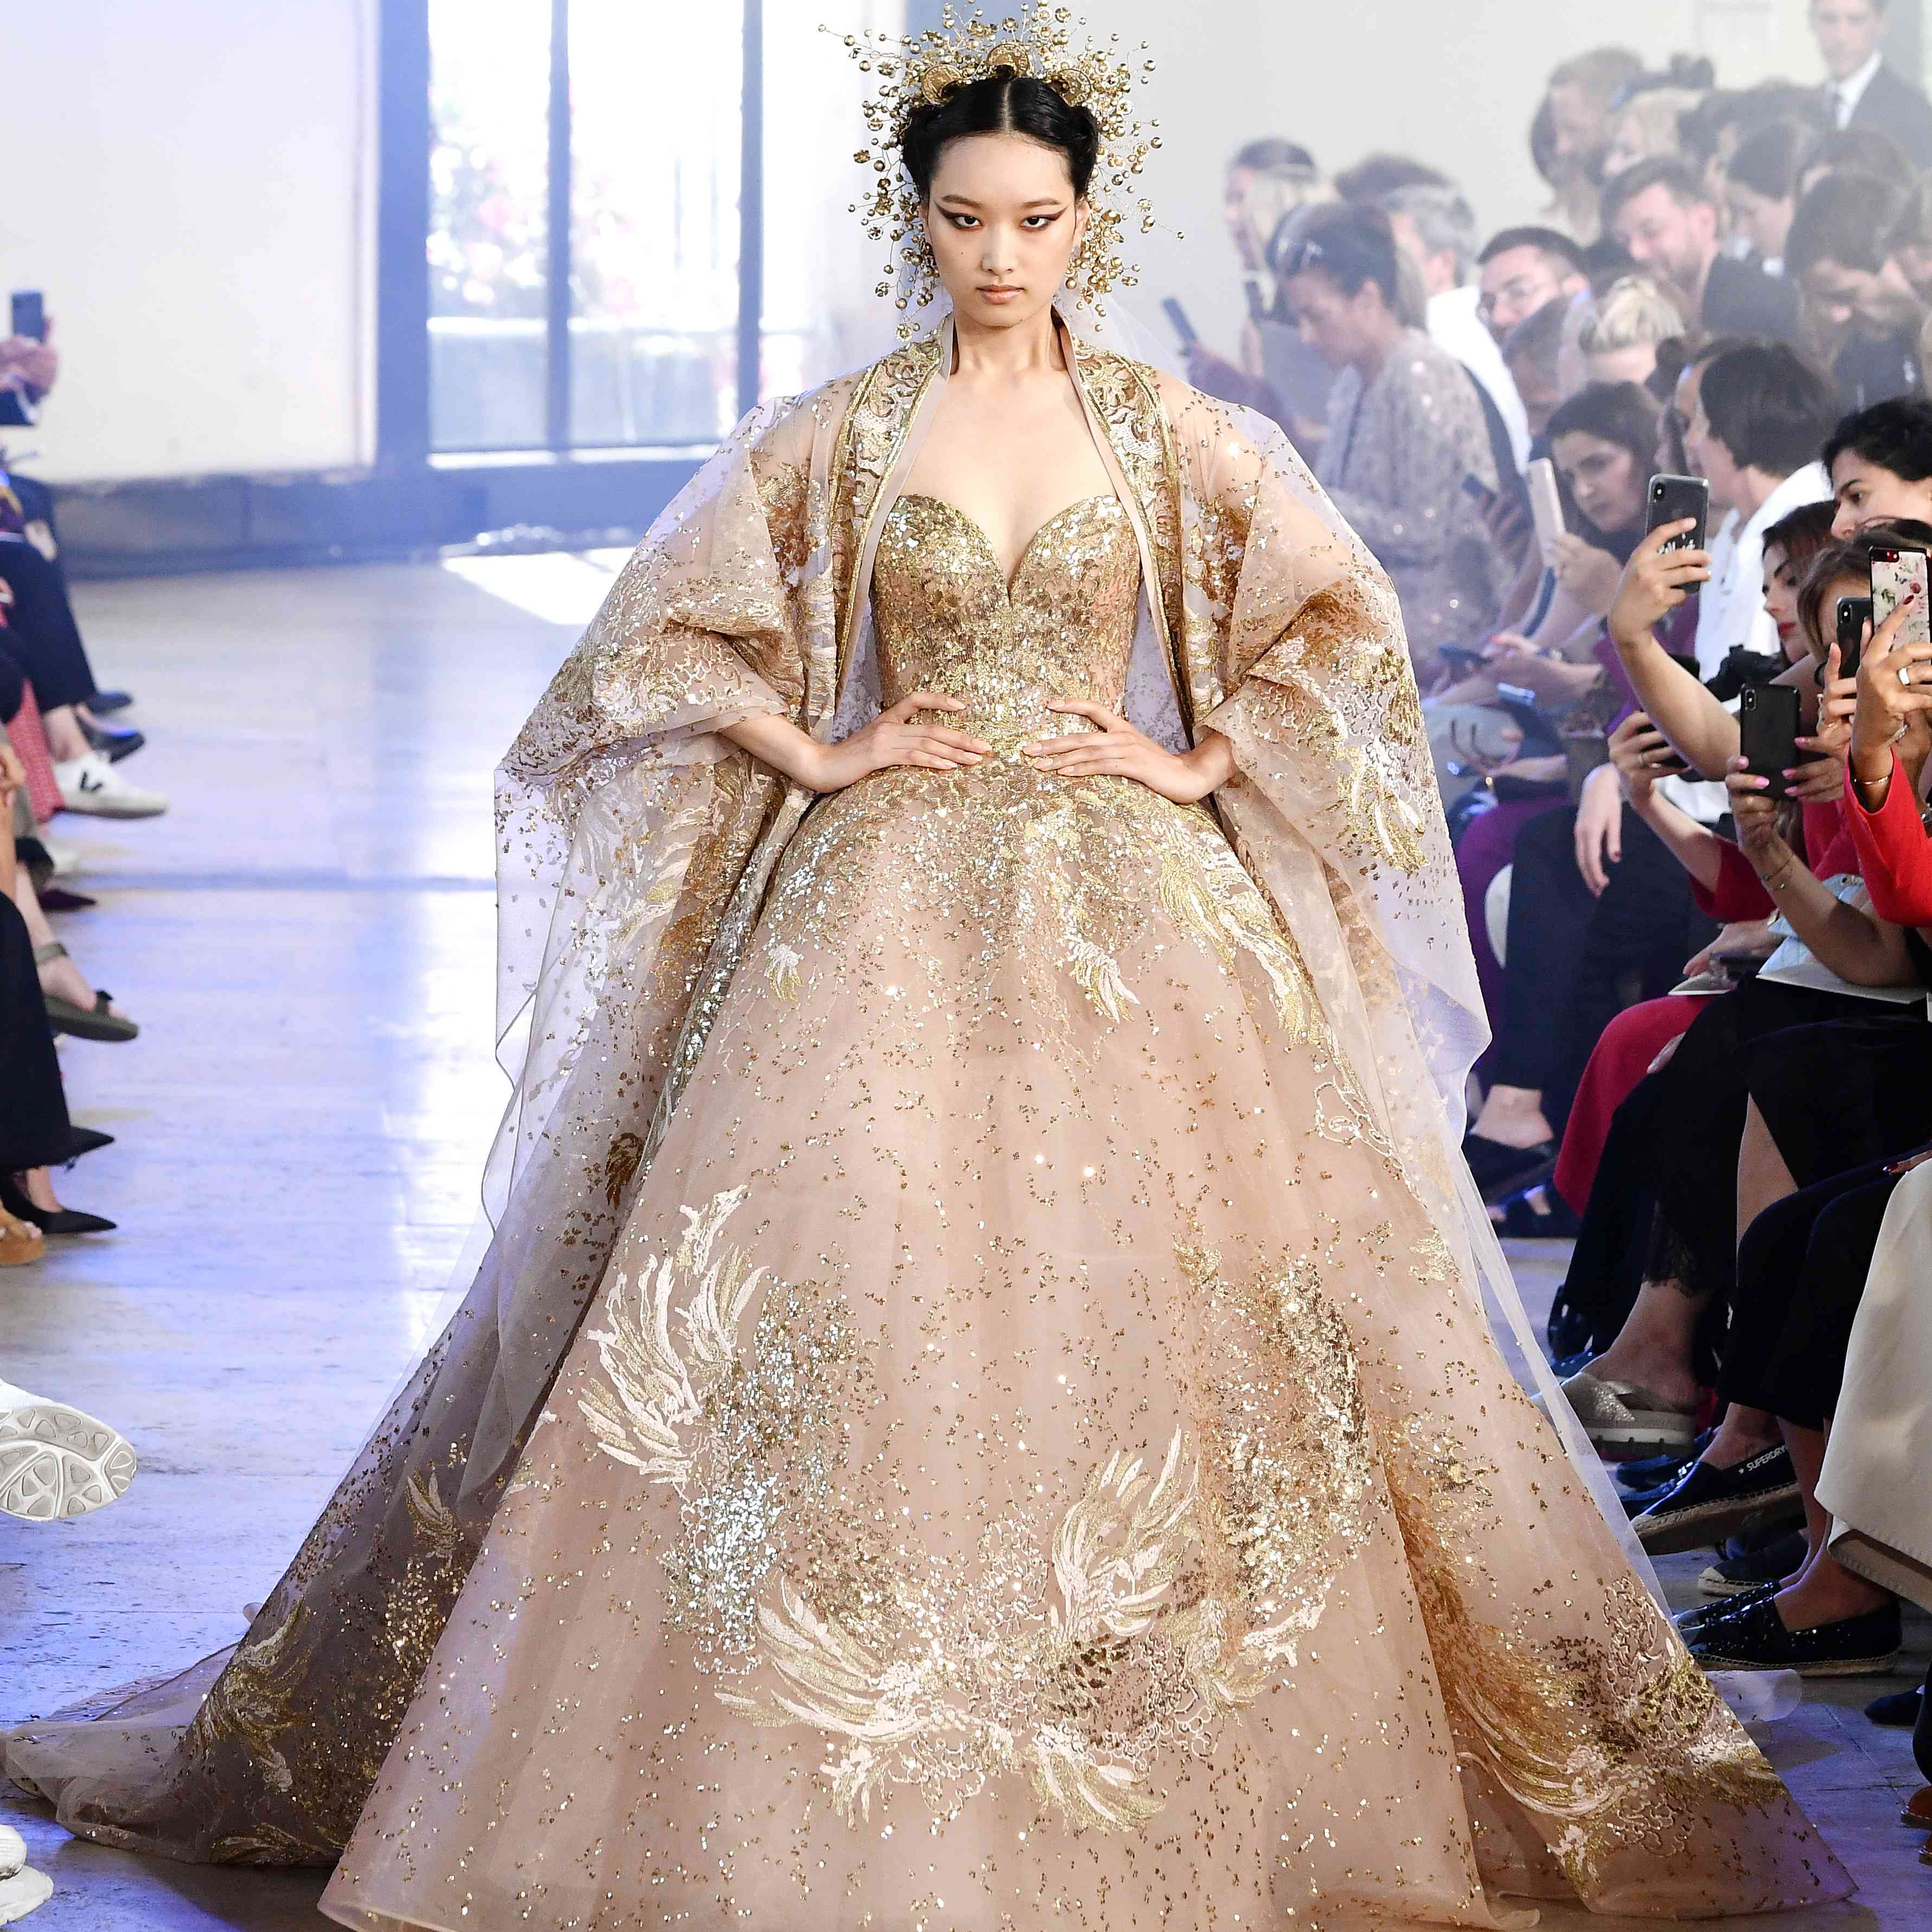 Model walking runway in gold princess wedding gown with overcoat